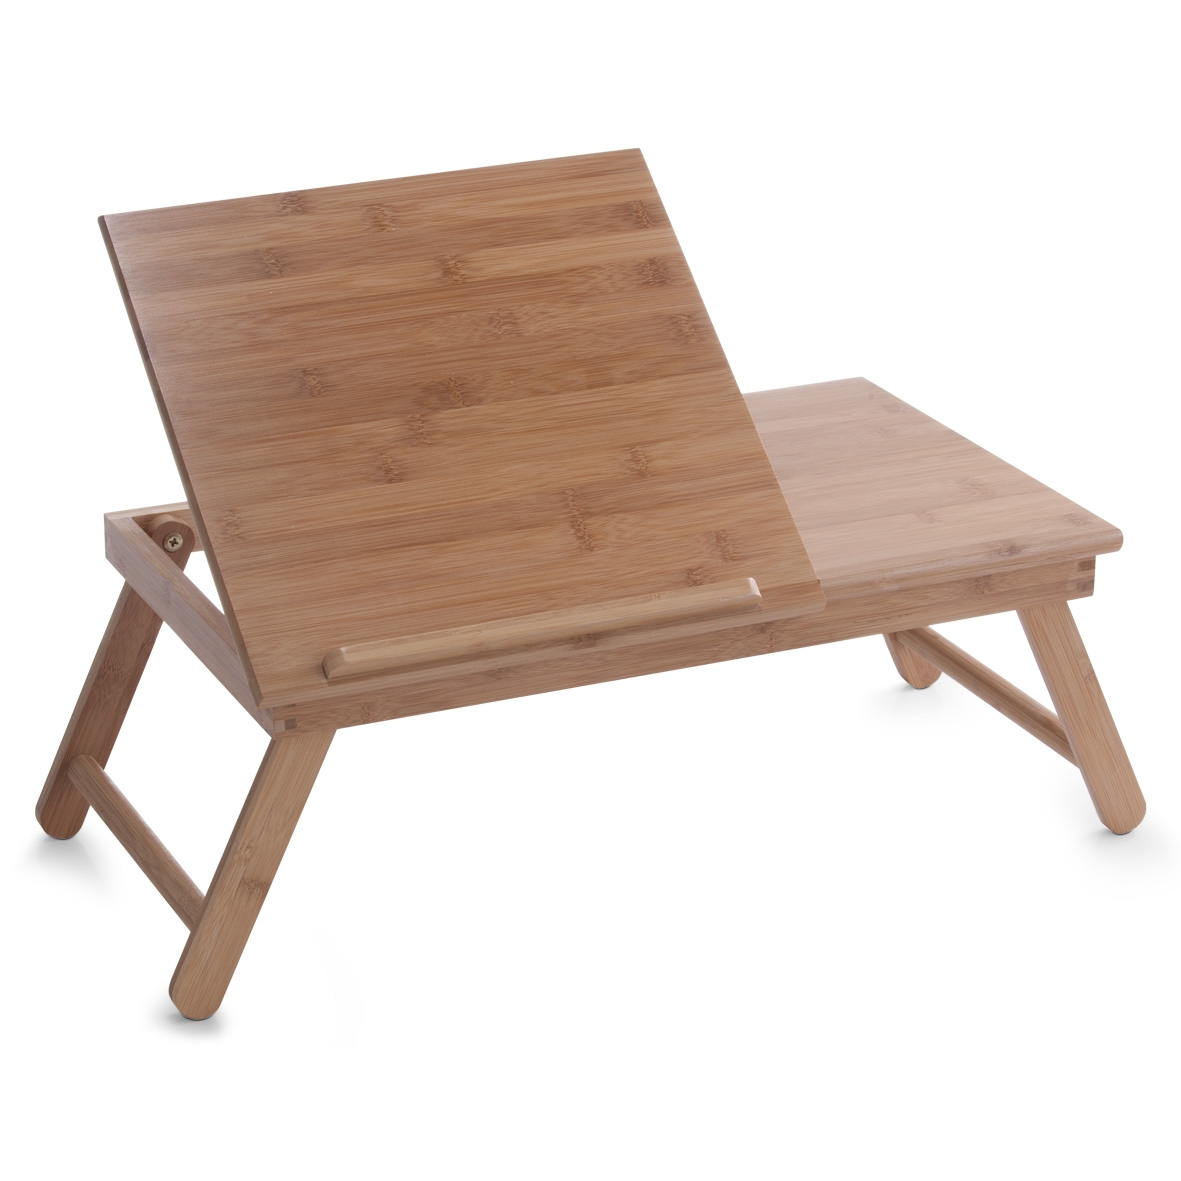 Masuta pentru servire pat, cu suport de carte, Natural Bamboo, L55xl33xH21,5 cm imagine